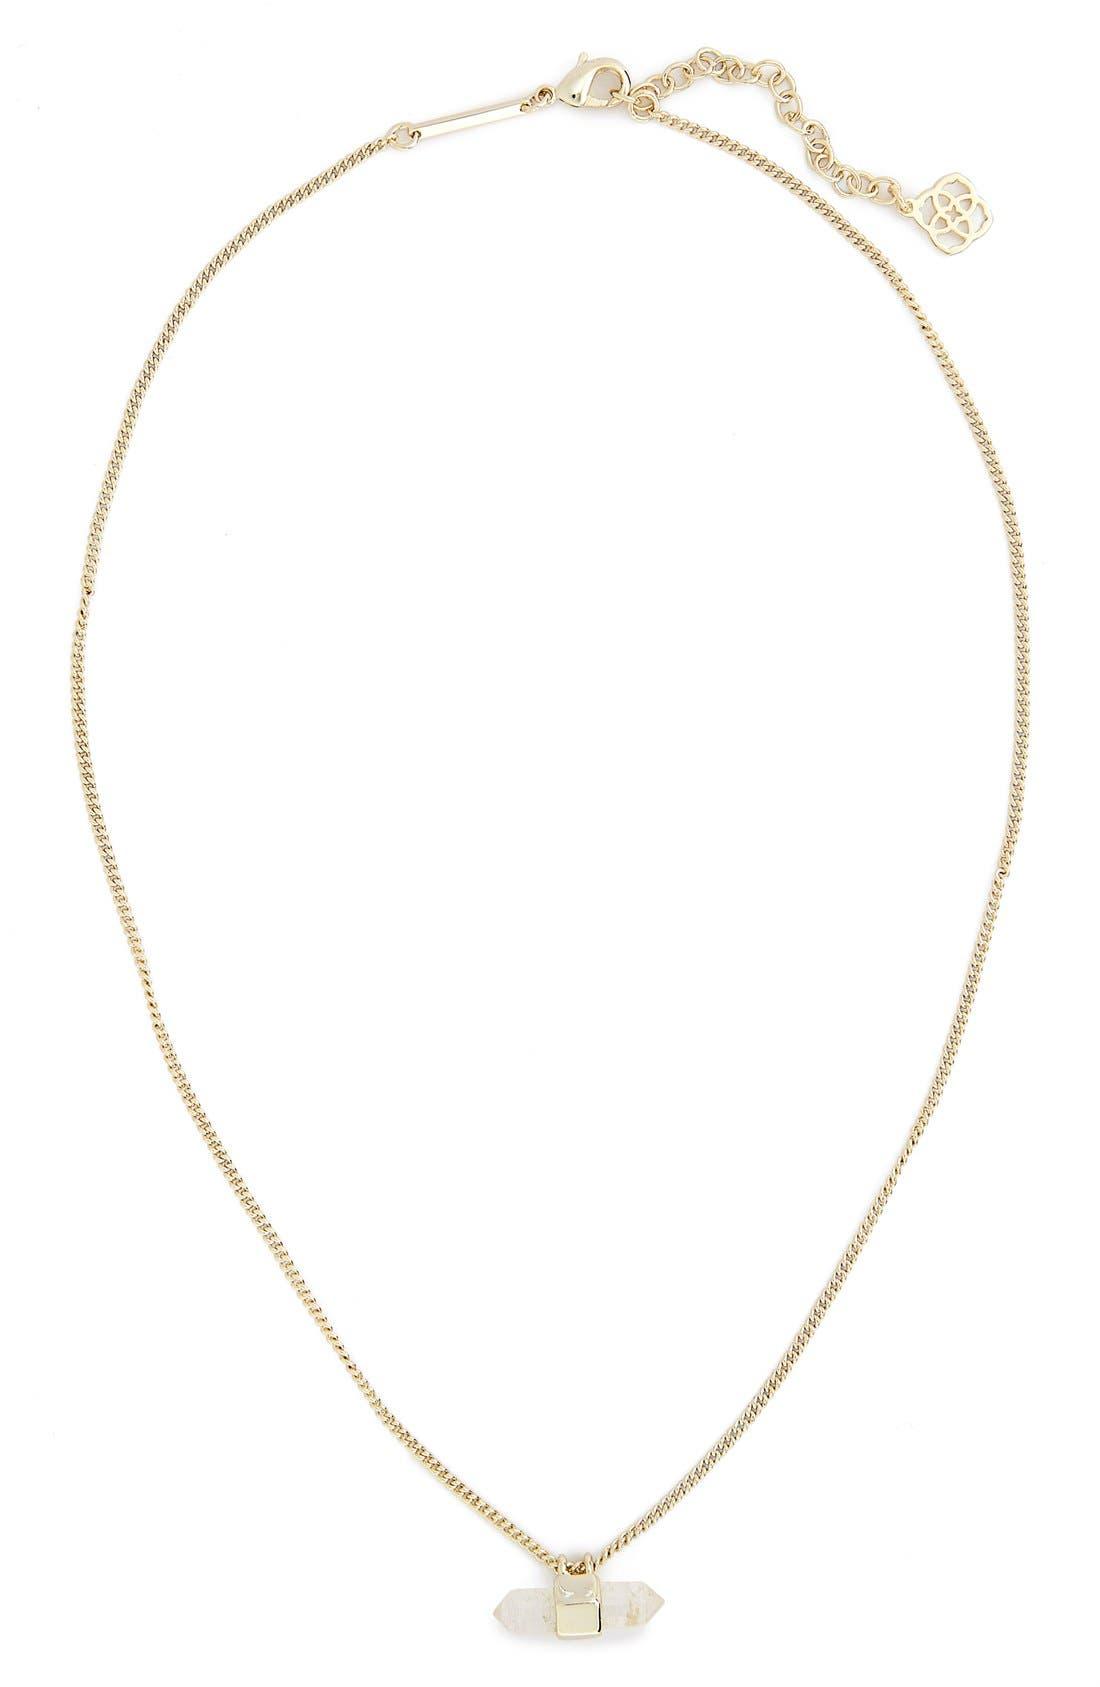 Main Image - Kendra Scott 'Amanda' Pendant Necklace